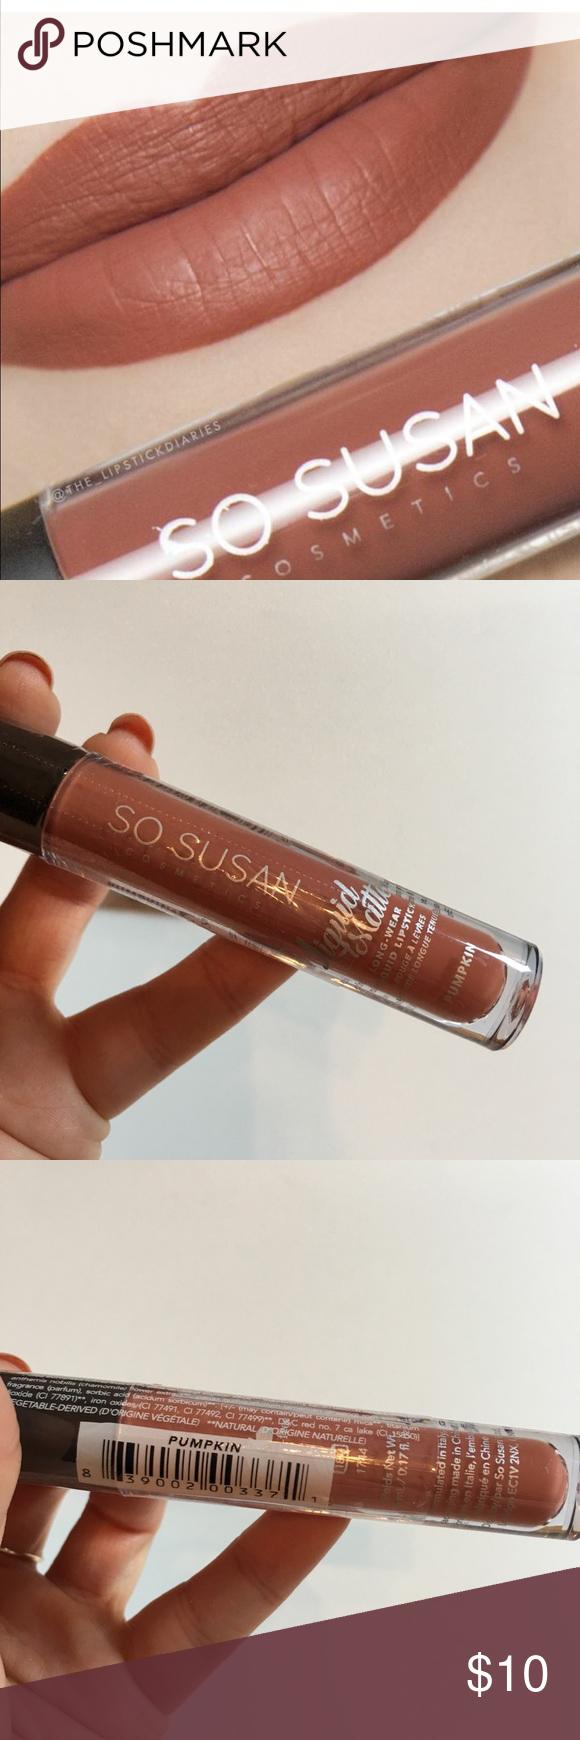 So Susan Liquid Matte Lipstick In Pumpkin Matte Liquid Lipstick Matte Lipstick Lipstick